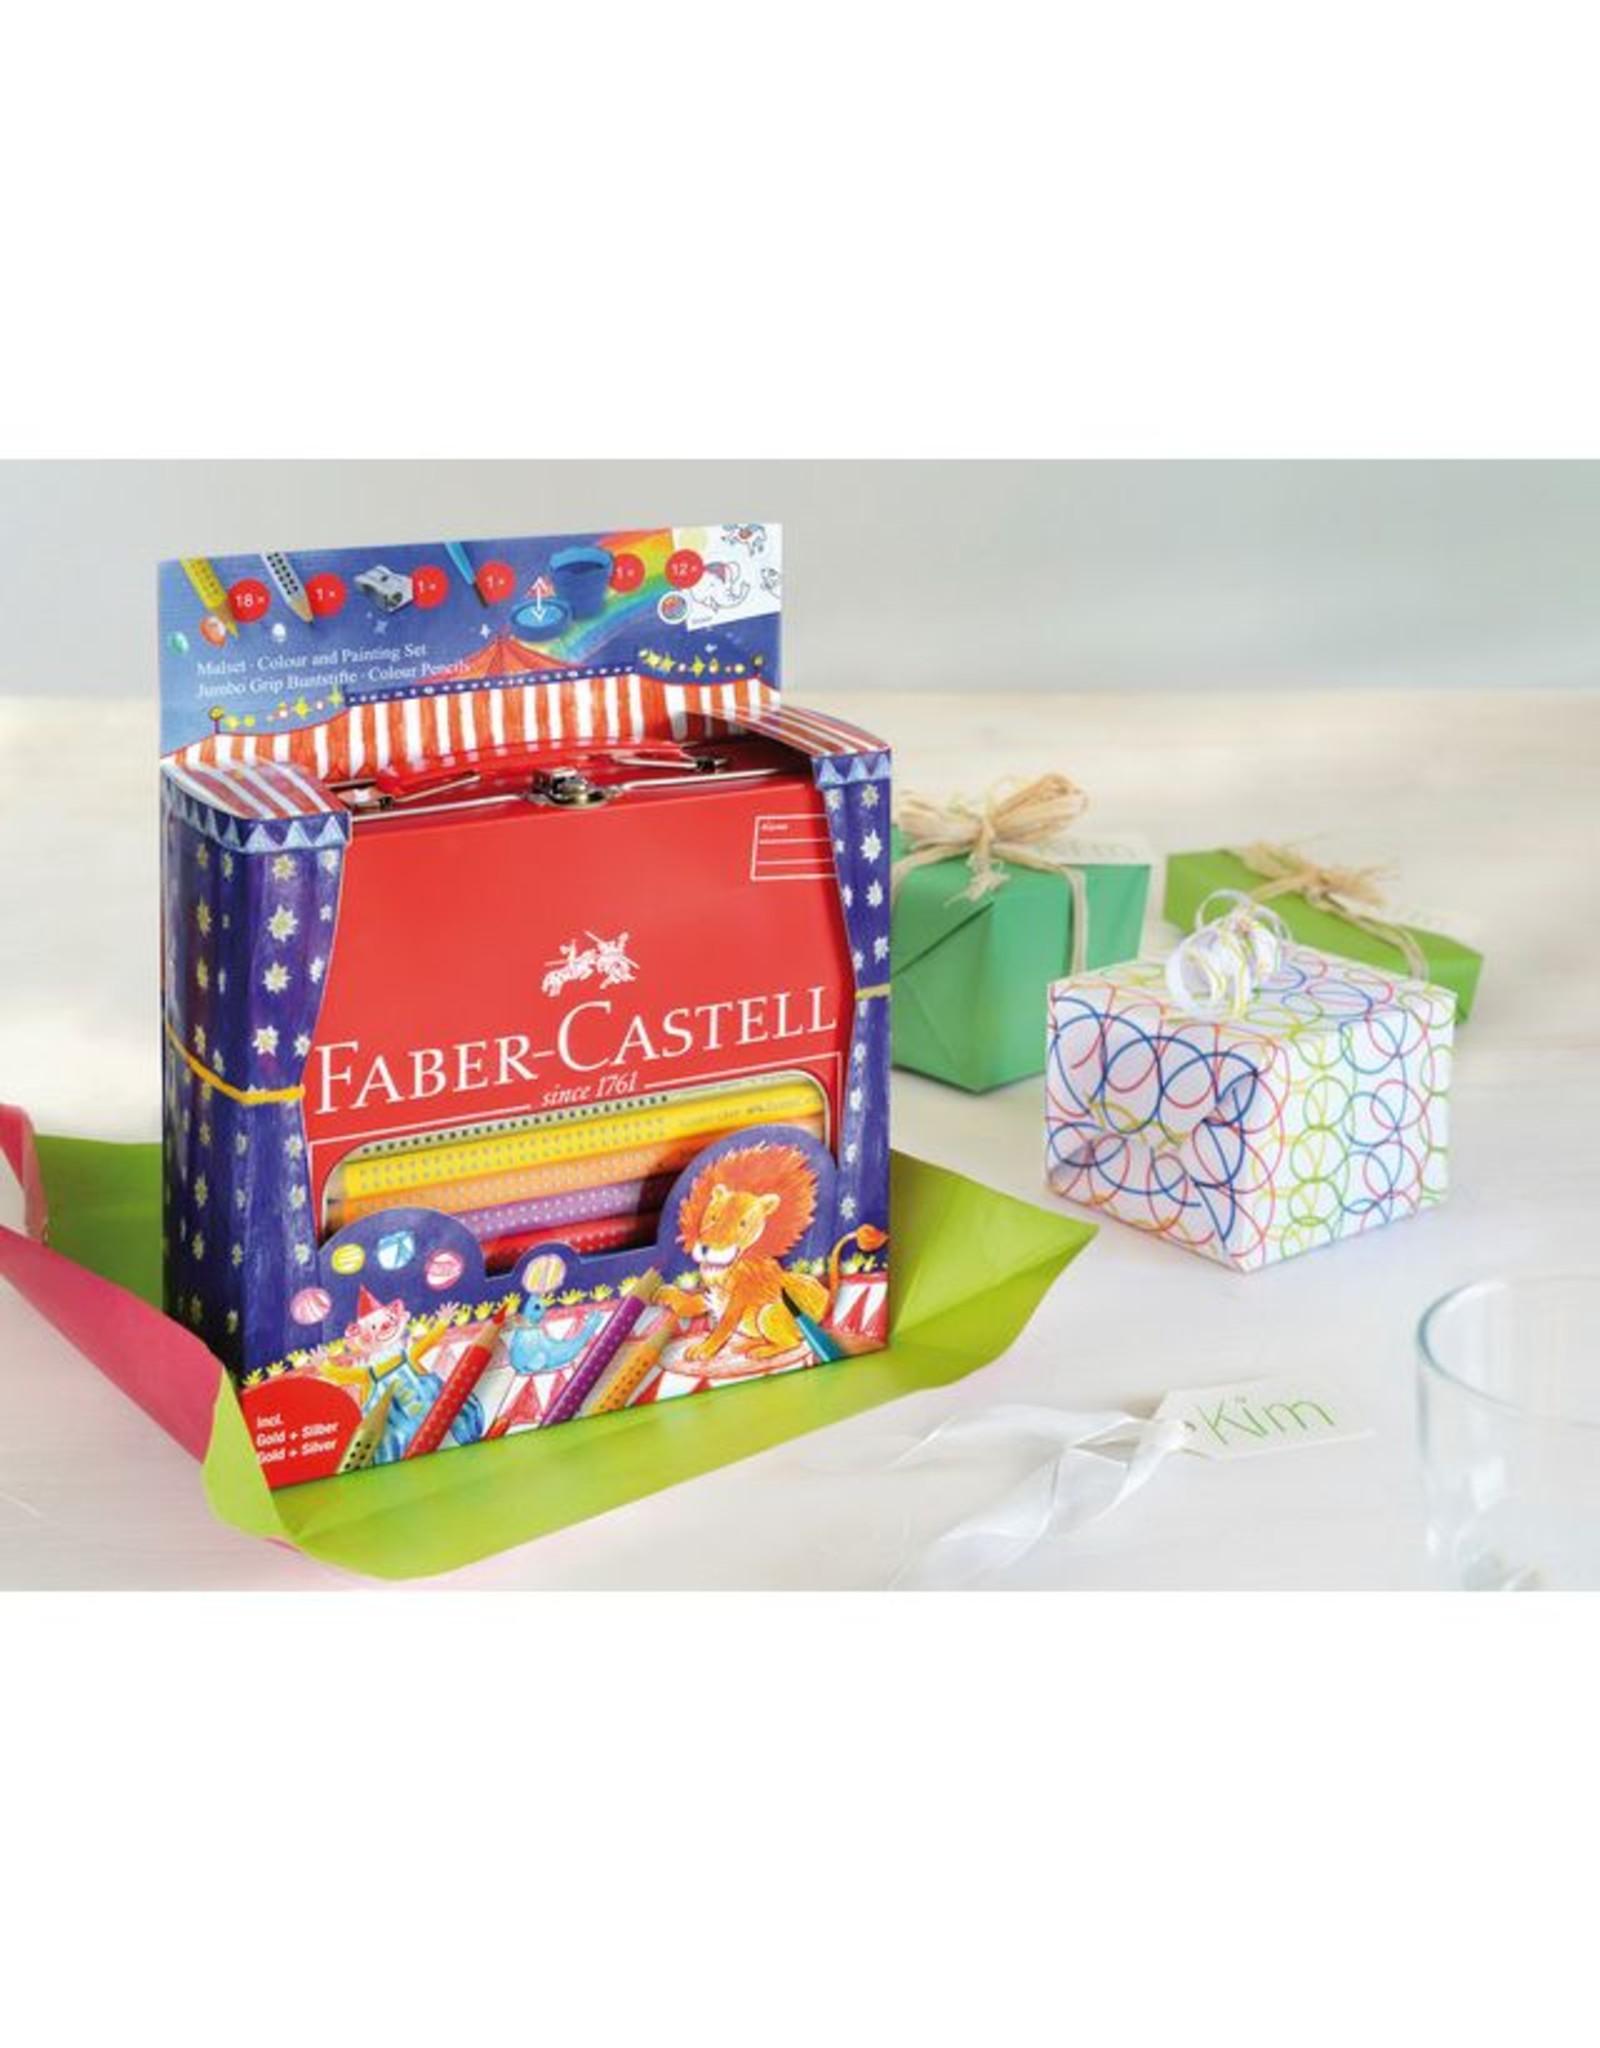 Faber Castell koffer